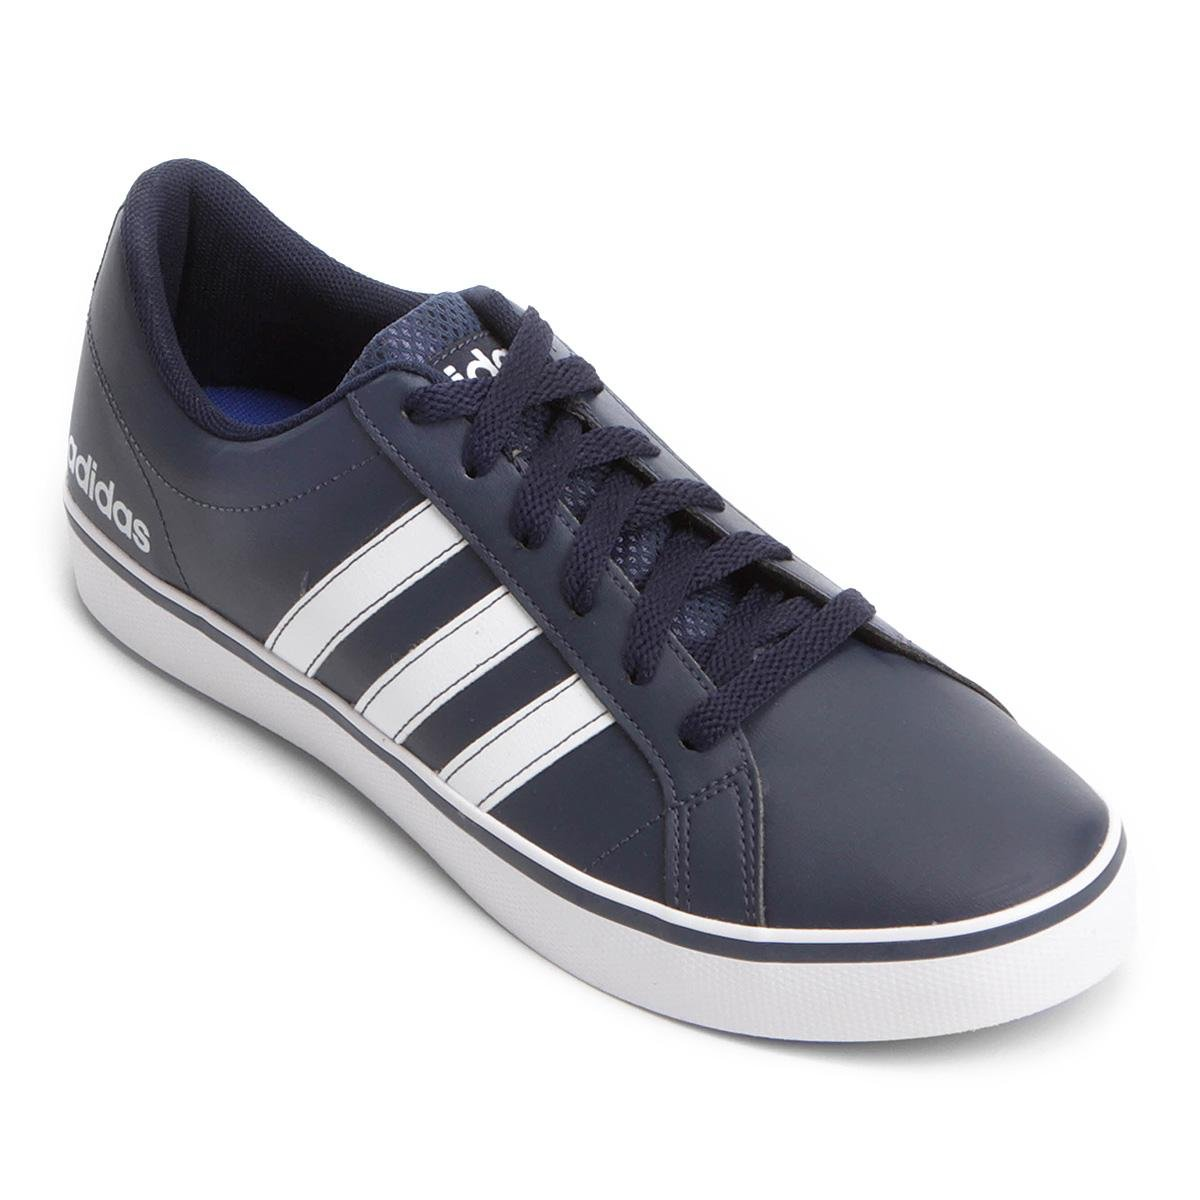 6a87bc9b1 Tênis Adidas Vs Pace Masculino - Azul - Compre Agora